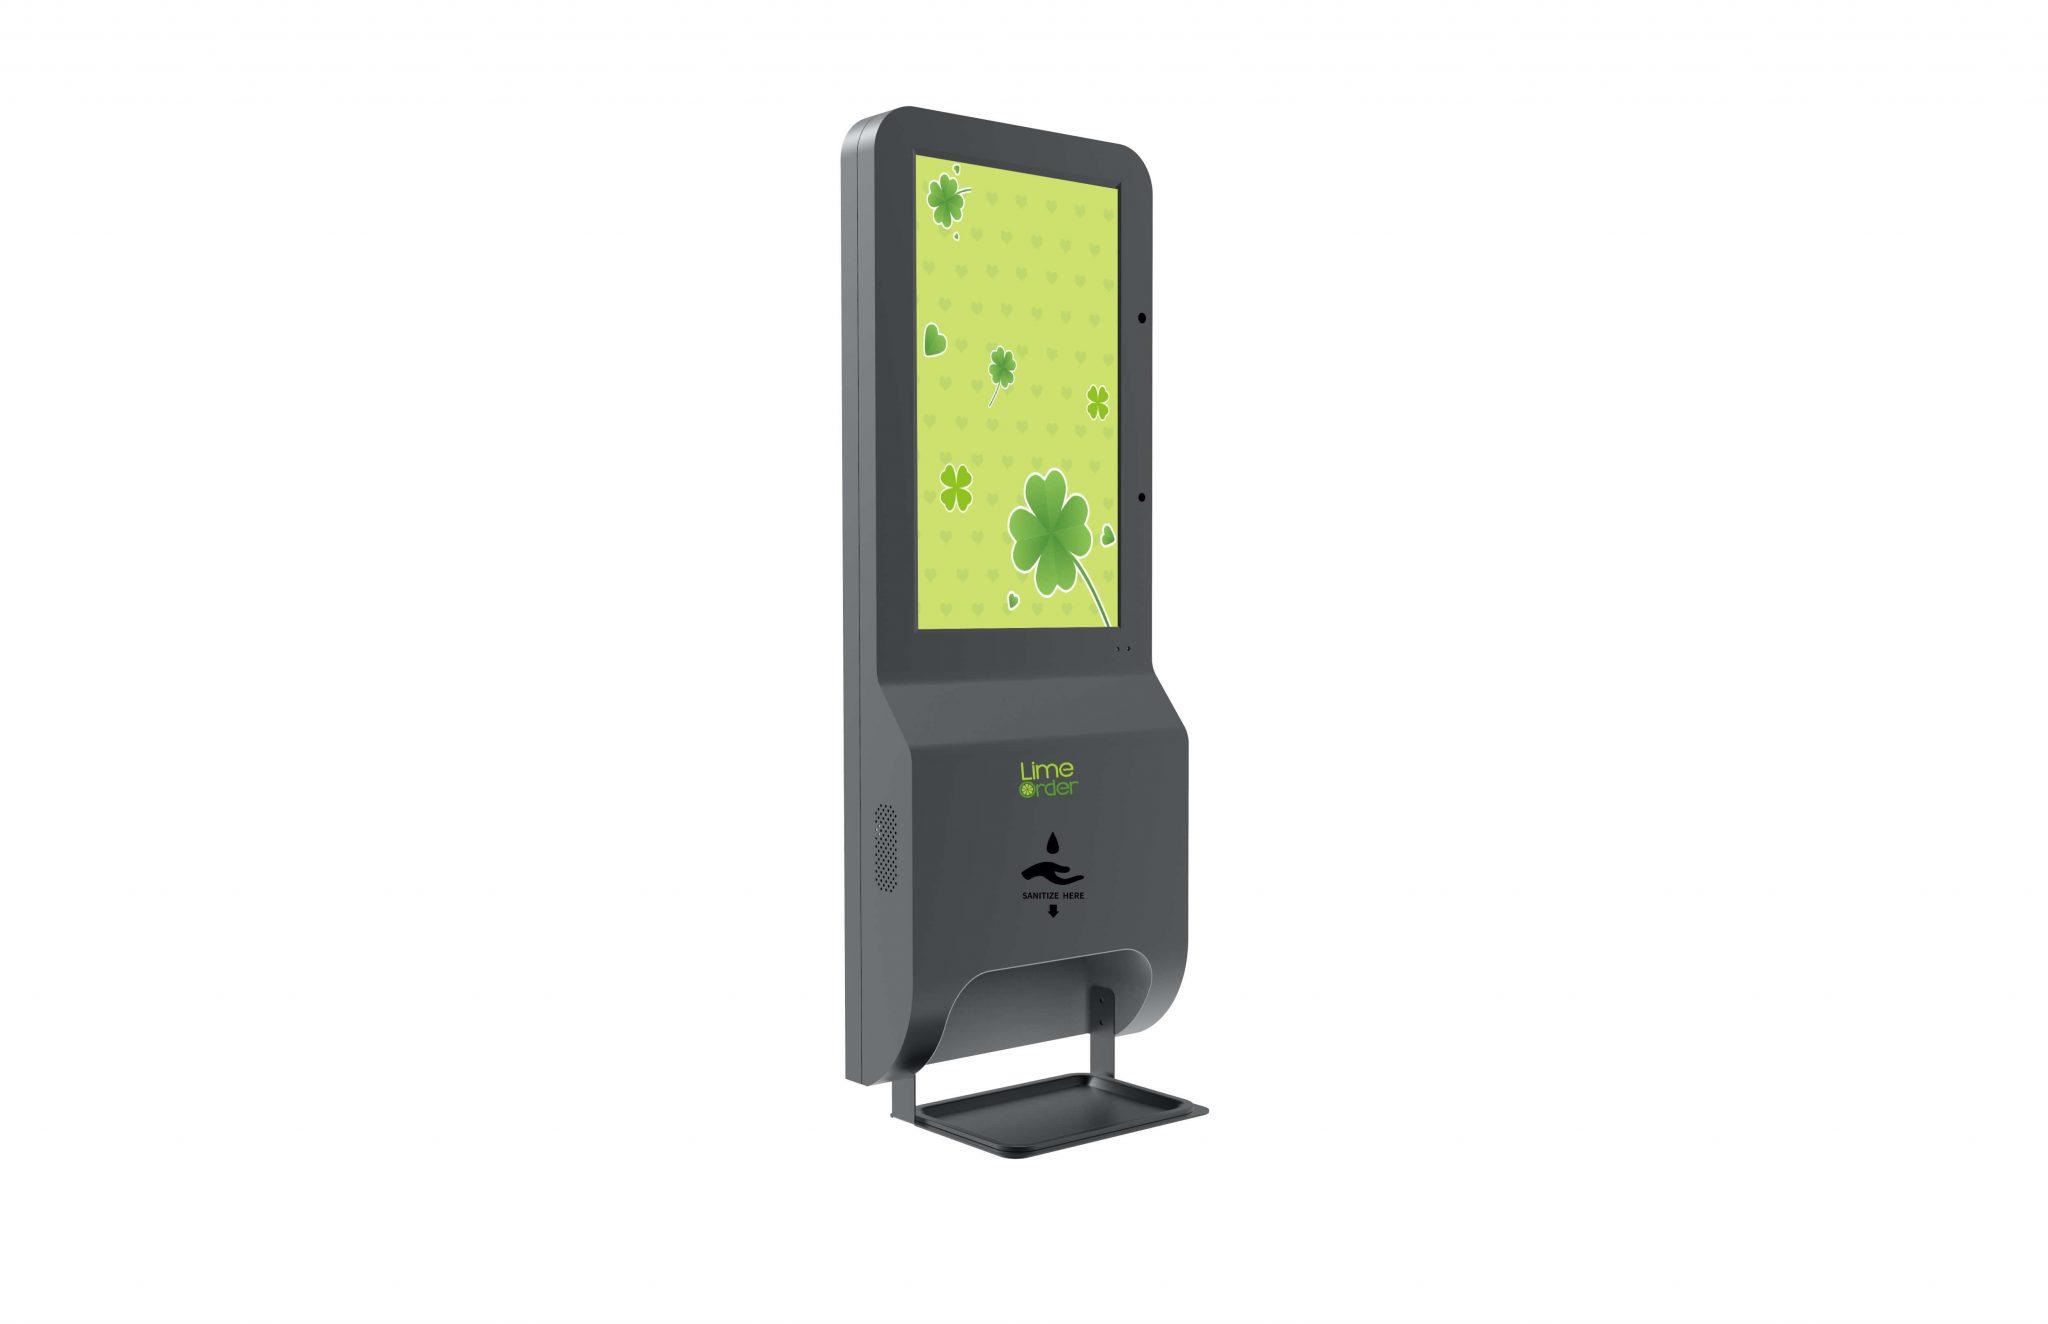 LimeOrder Temperature Sanitizer Kiosk 21 inch2